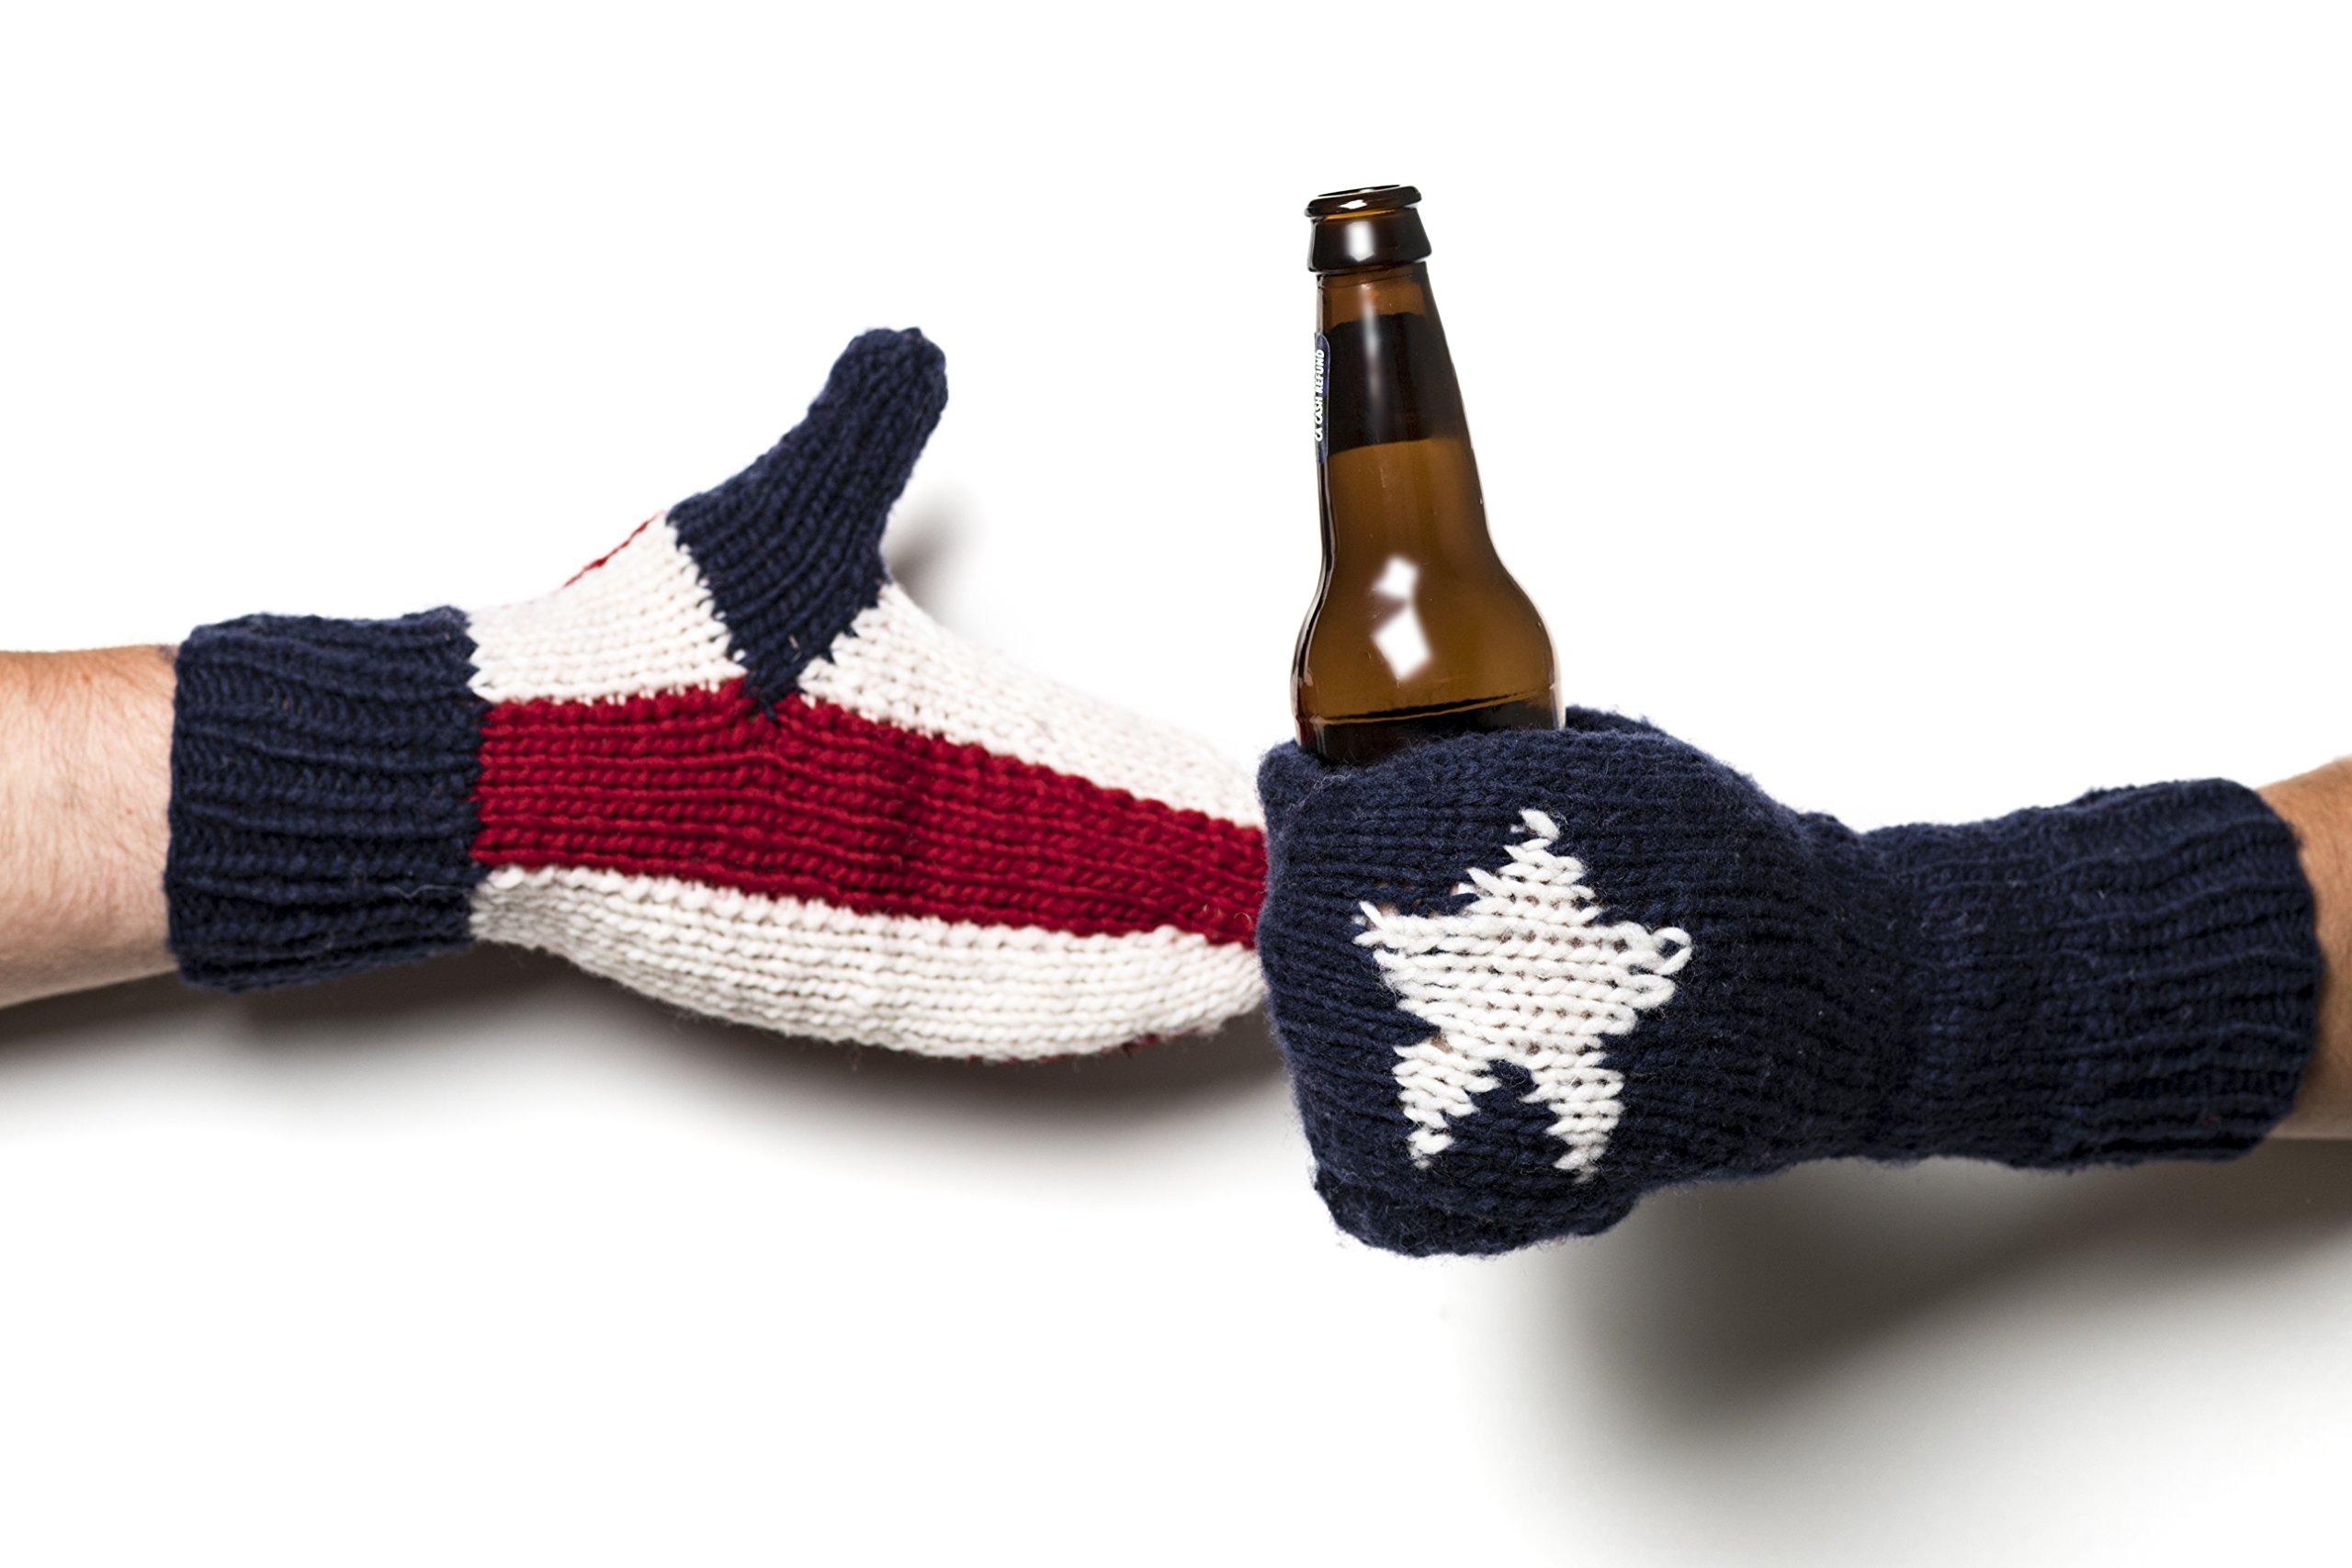 Camp Kitschy Knits USA Wool Beer Mittens Pair Drink Holder Wool Glove Stocking Stuffer Men